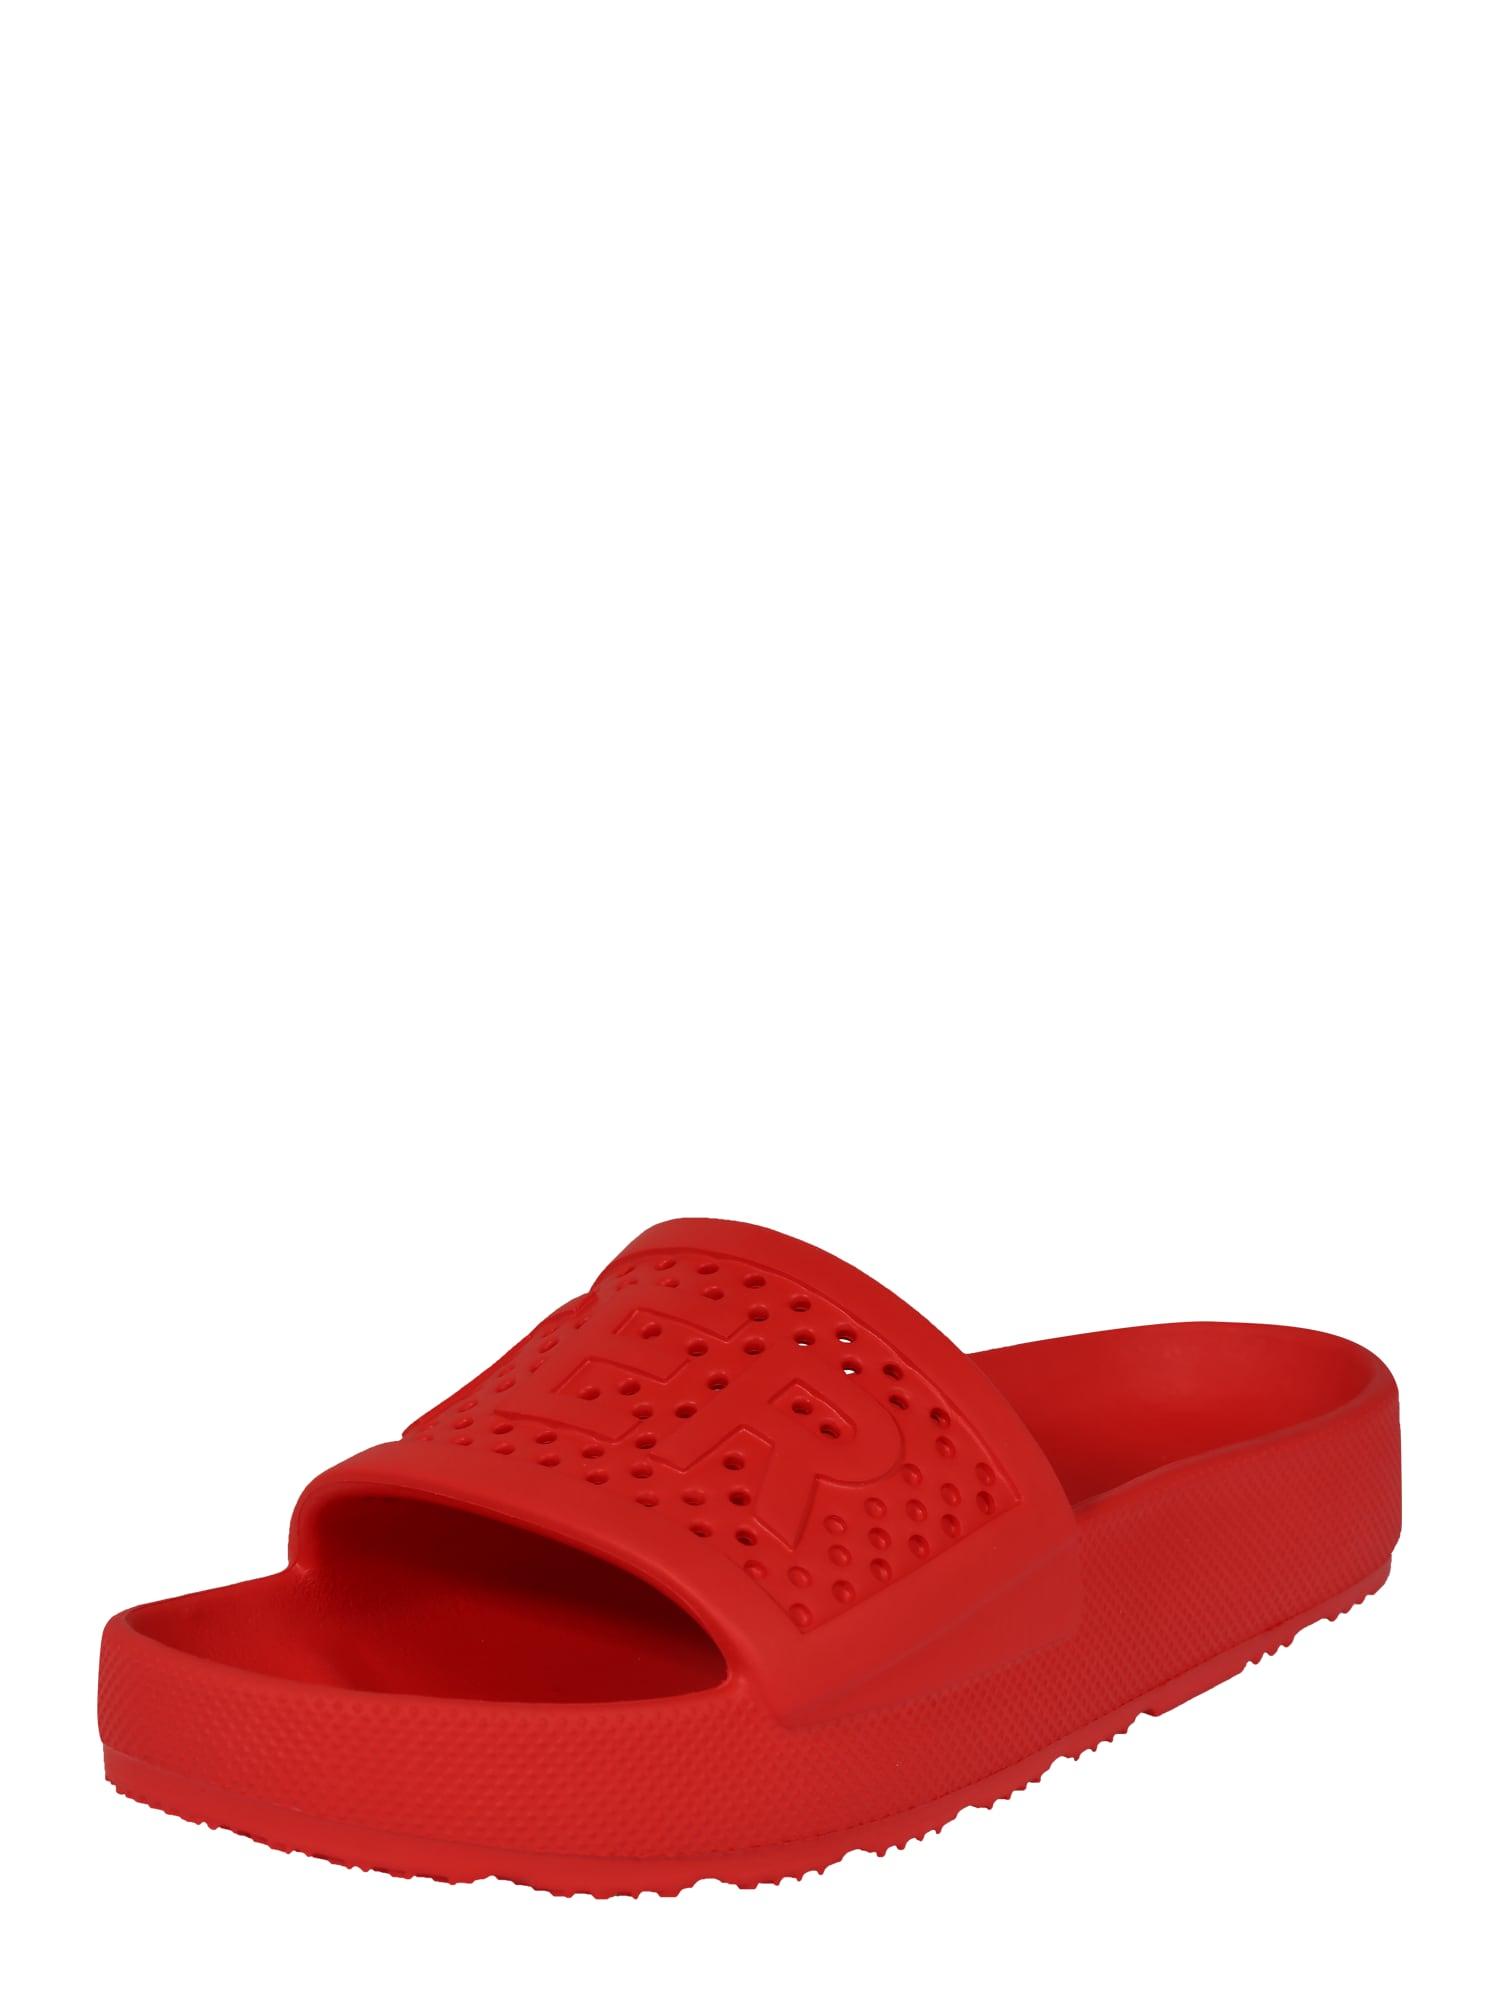 HUNTER Pantofle 'Womens Original light weight moulded slide'  černá / červená